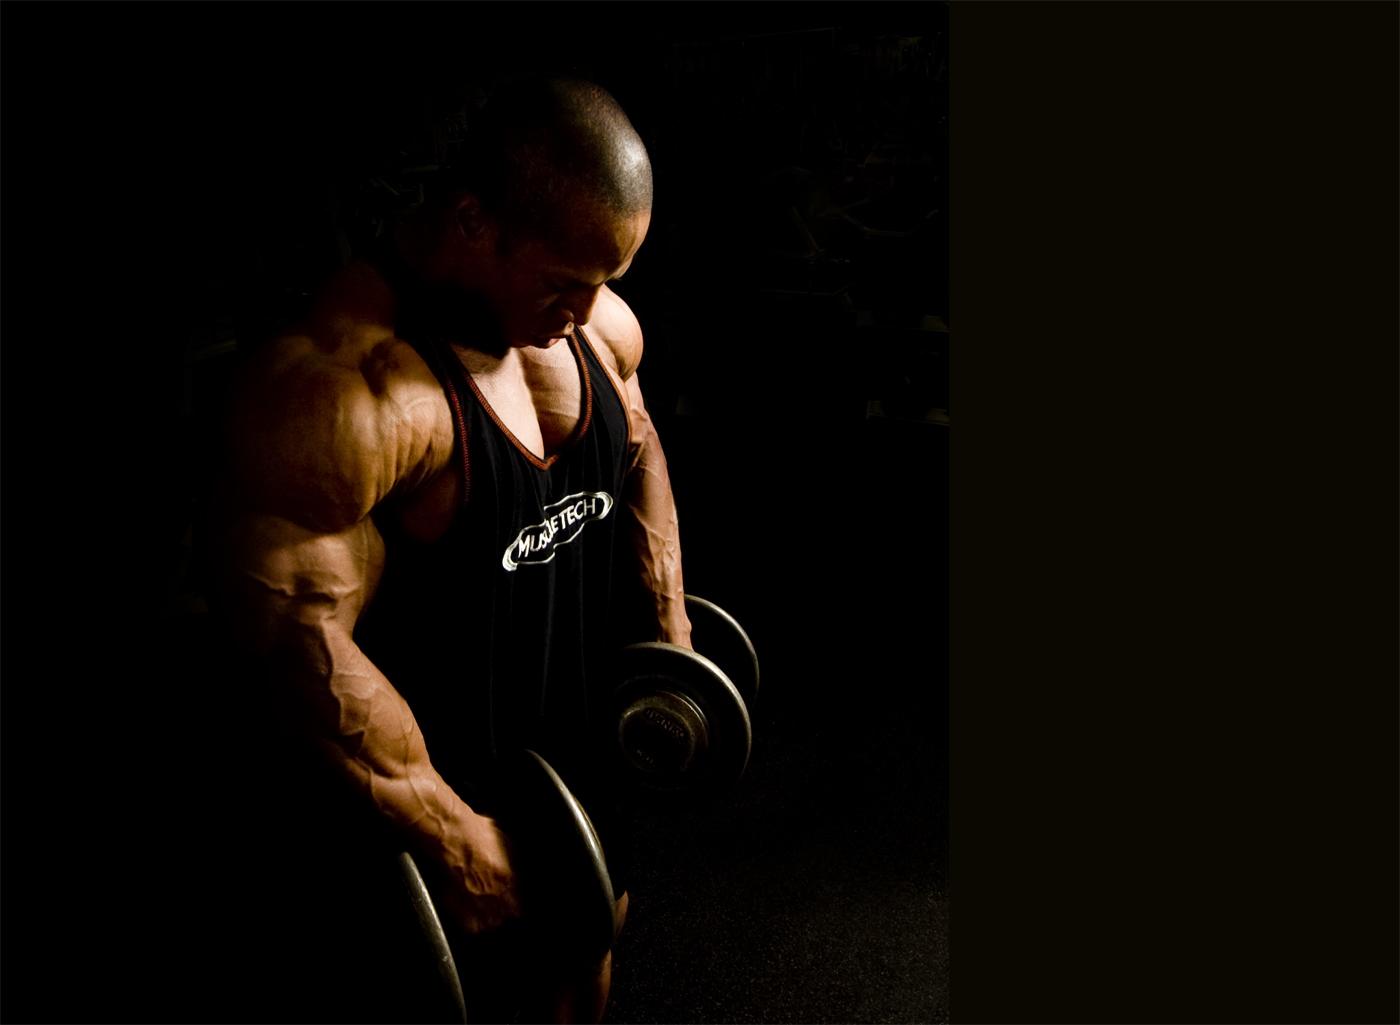 OH, HENRY! - Airman is world-class bodybuilder > Torch Magazine